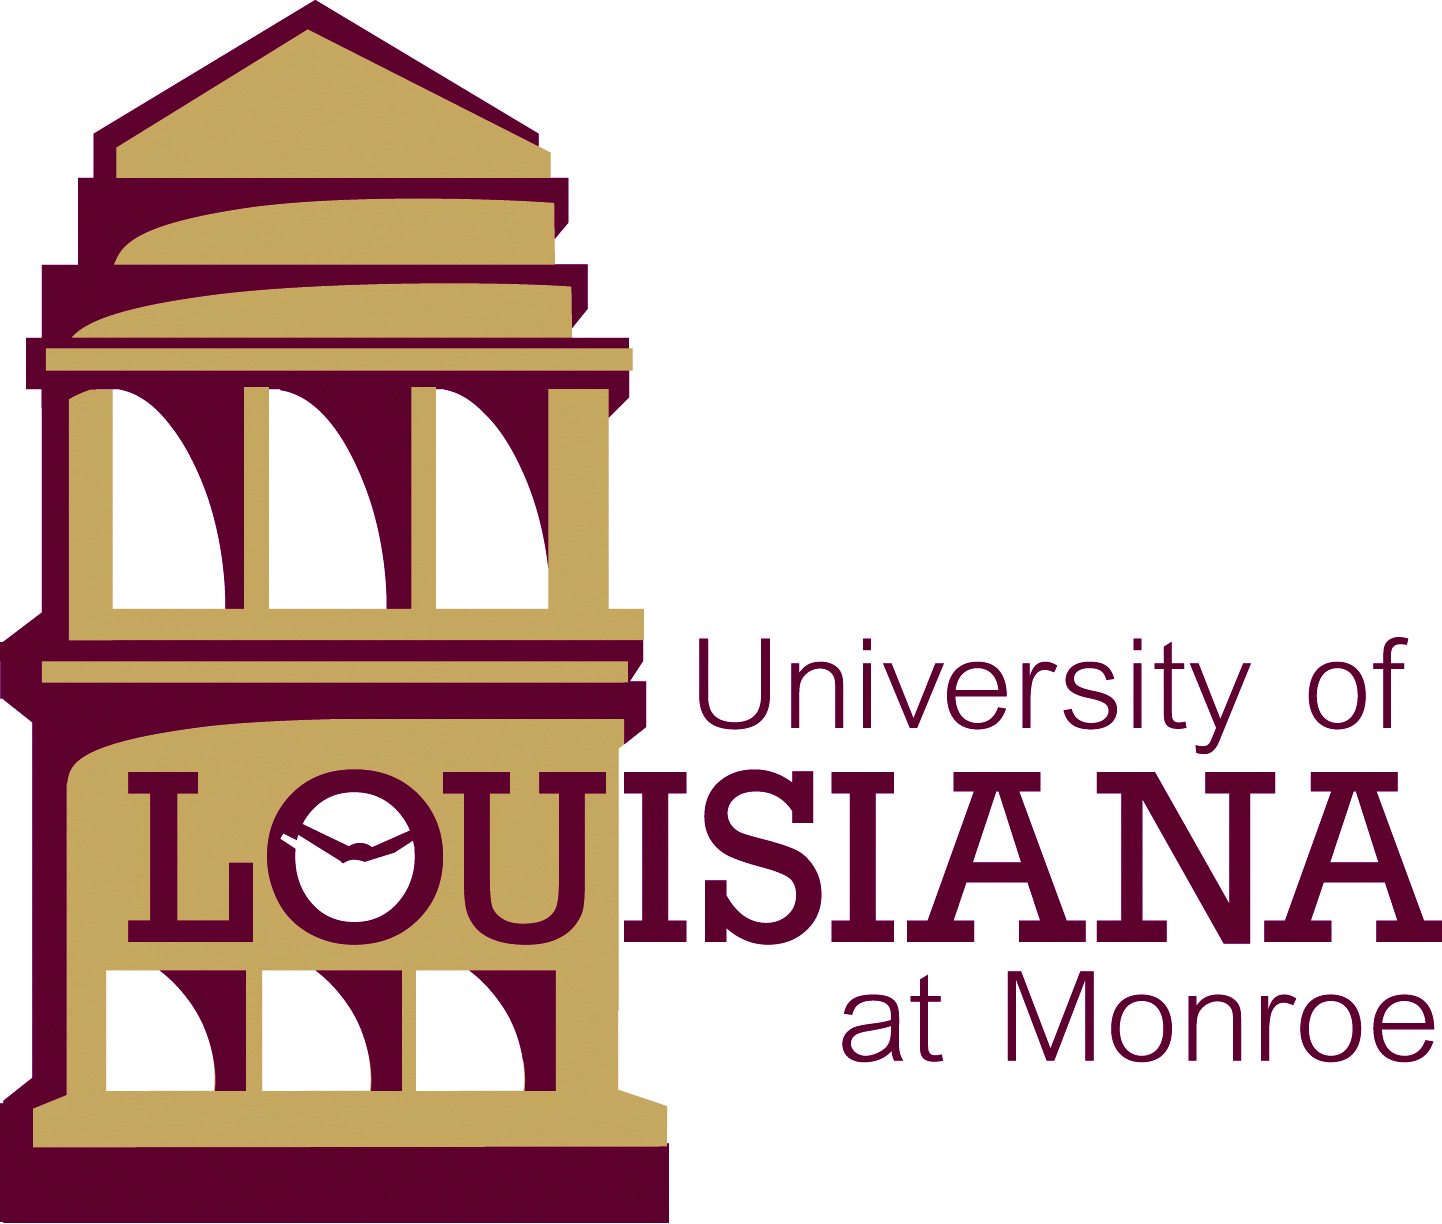 University of Louisiana at Monroe.